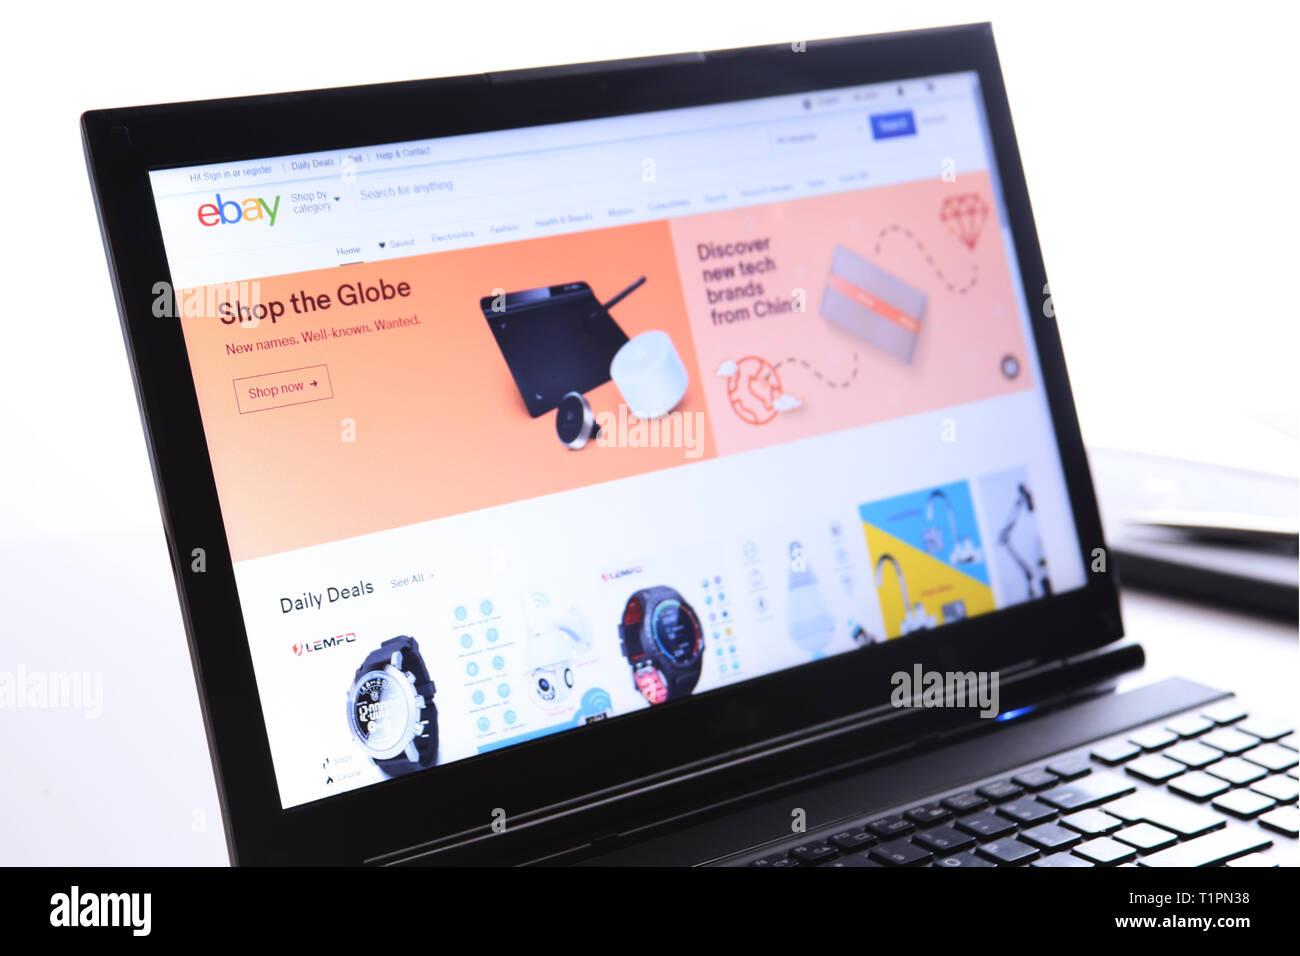 New York, USA - 25 mars 2019: Editorial d'illustration de site Internet de eBay.com. logo eBay visible sur l'écran. Photo Stock